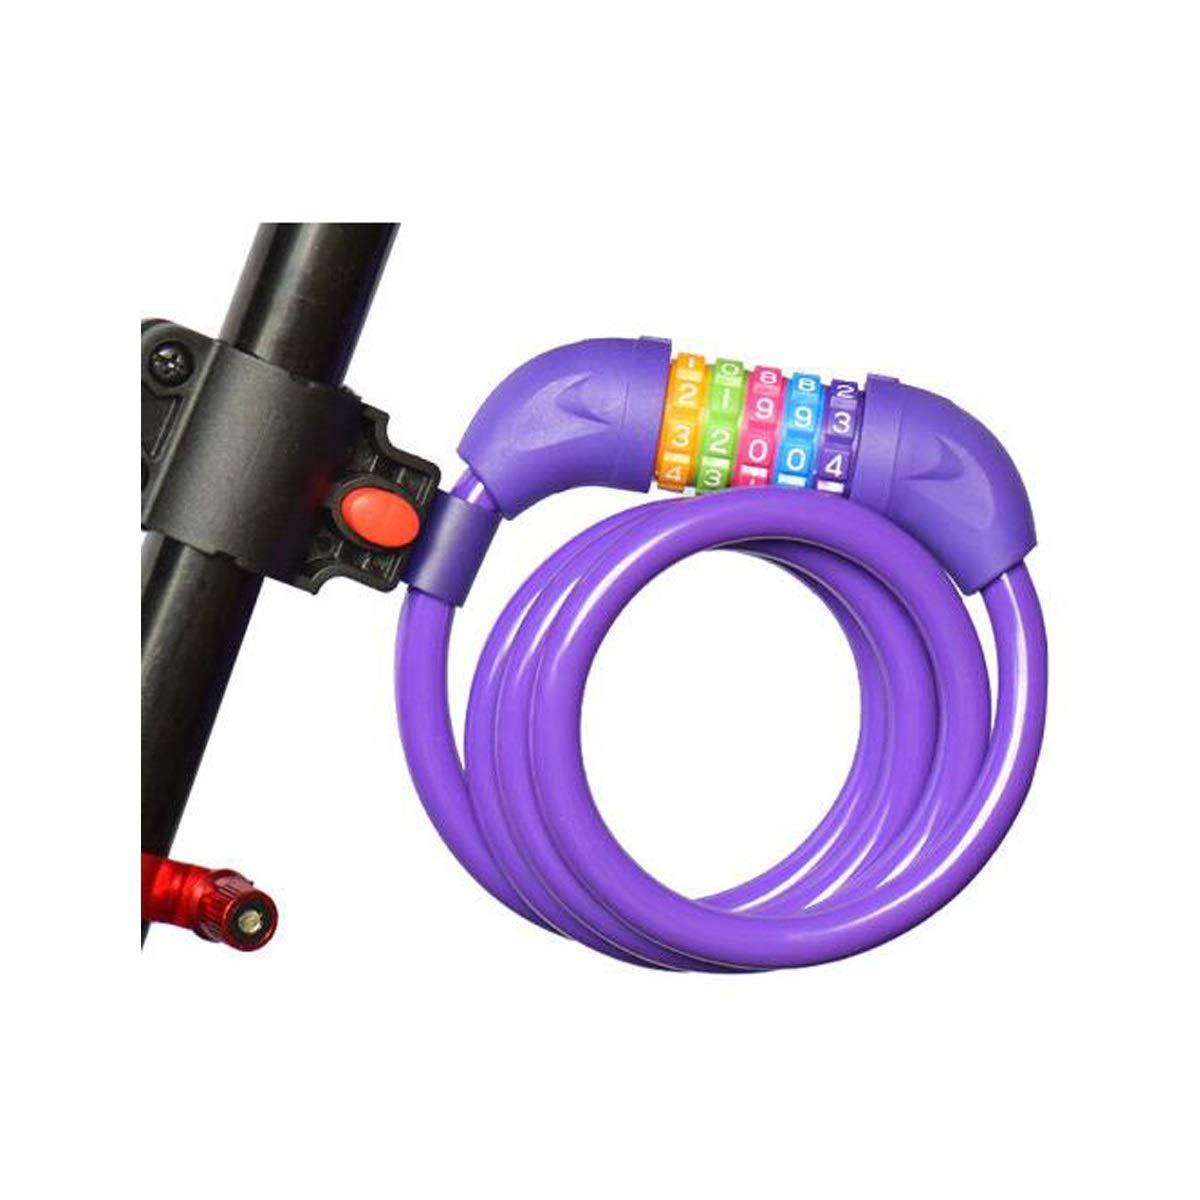 HUIJUNWENTI Mountain Bike Lock, Manganese Steel Lock, Sturdy Electric Lock, Anti-Theft Chain Lock, Chain Lock, Combination Lock, Blue, Purple, Black, Pink Safe and Reliable,